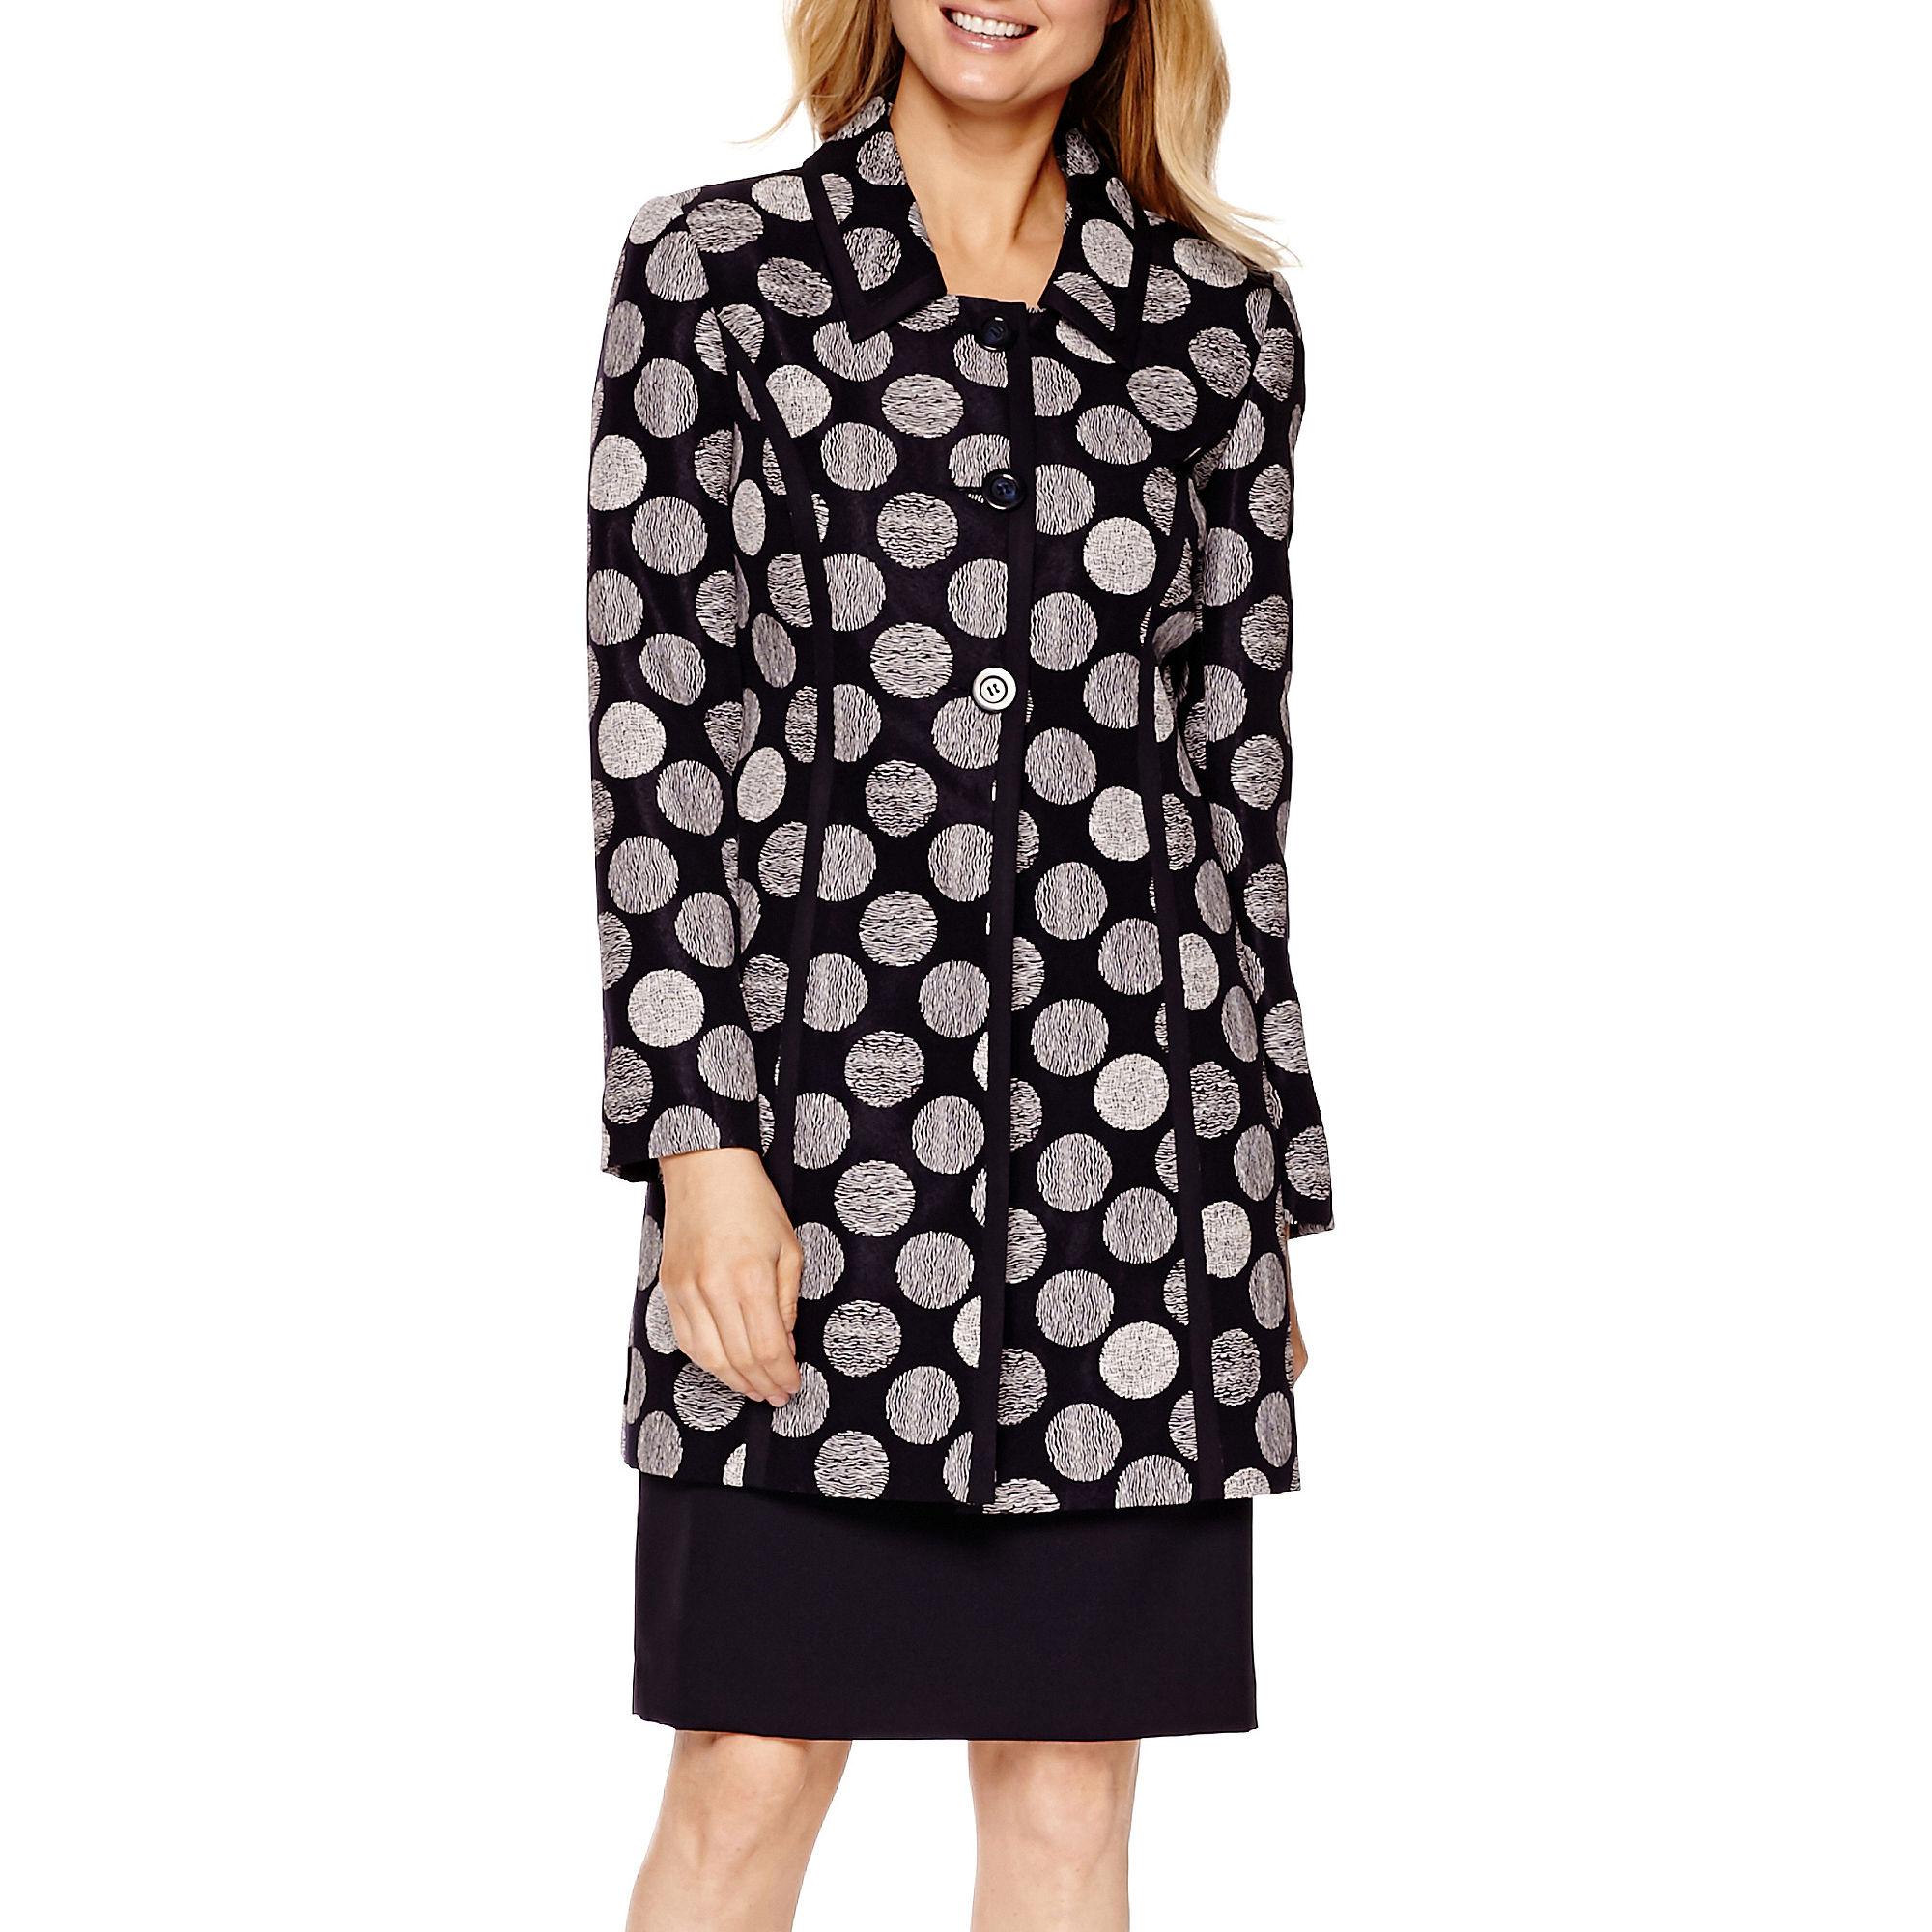 Isabella Long-Sleeve Jacquard Jacket and Skirt Suit Set